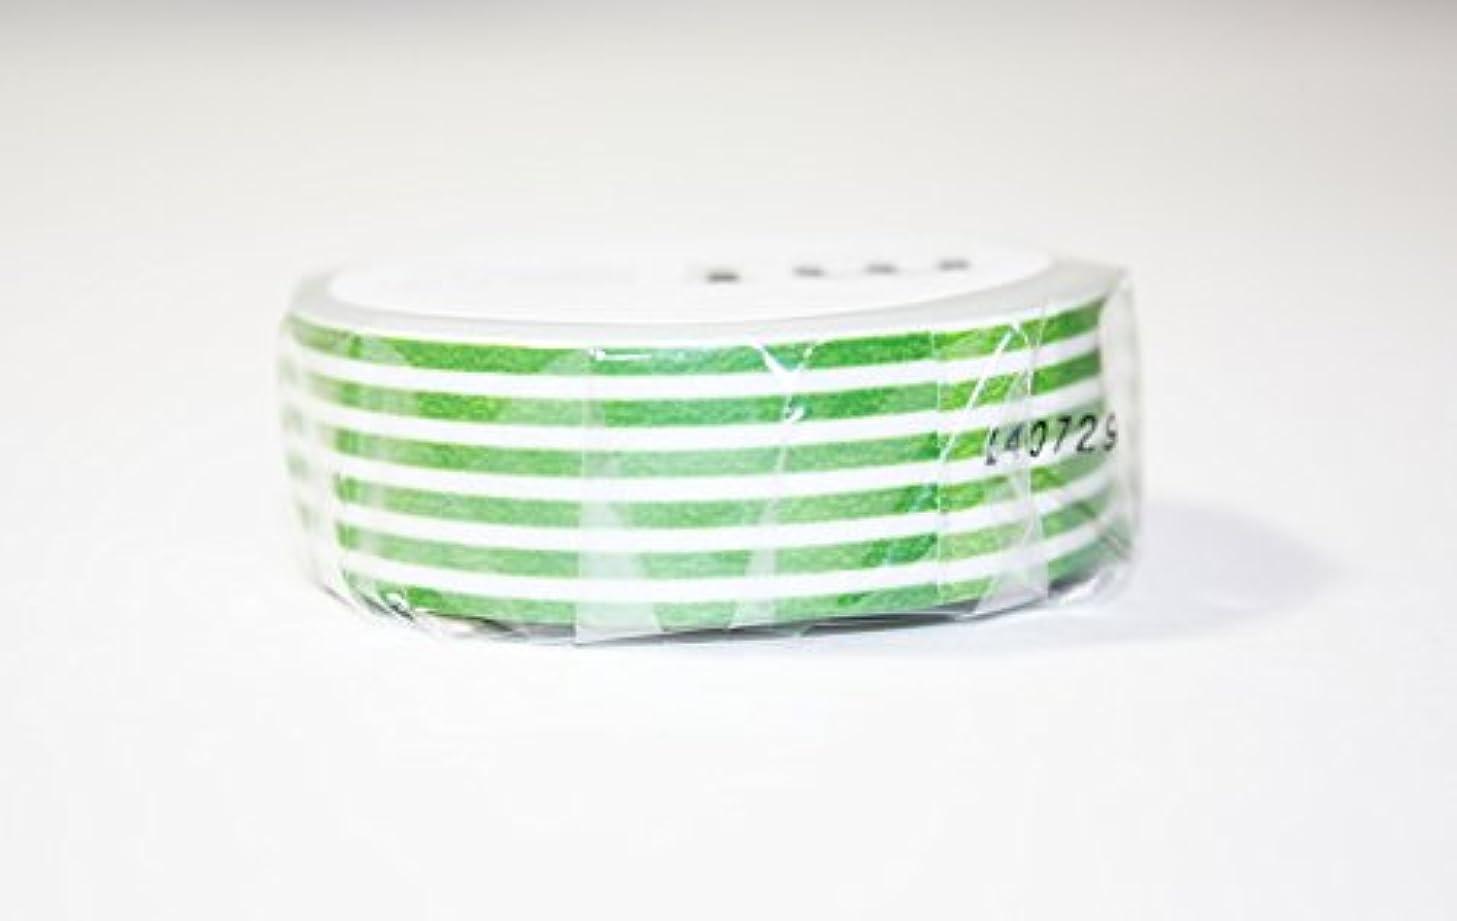 MT Washi Masking Tape, 1P Deco, 15mm x 10m, Border Light Green (MT01D258)